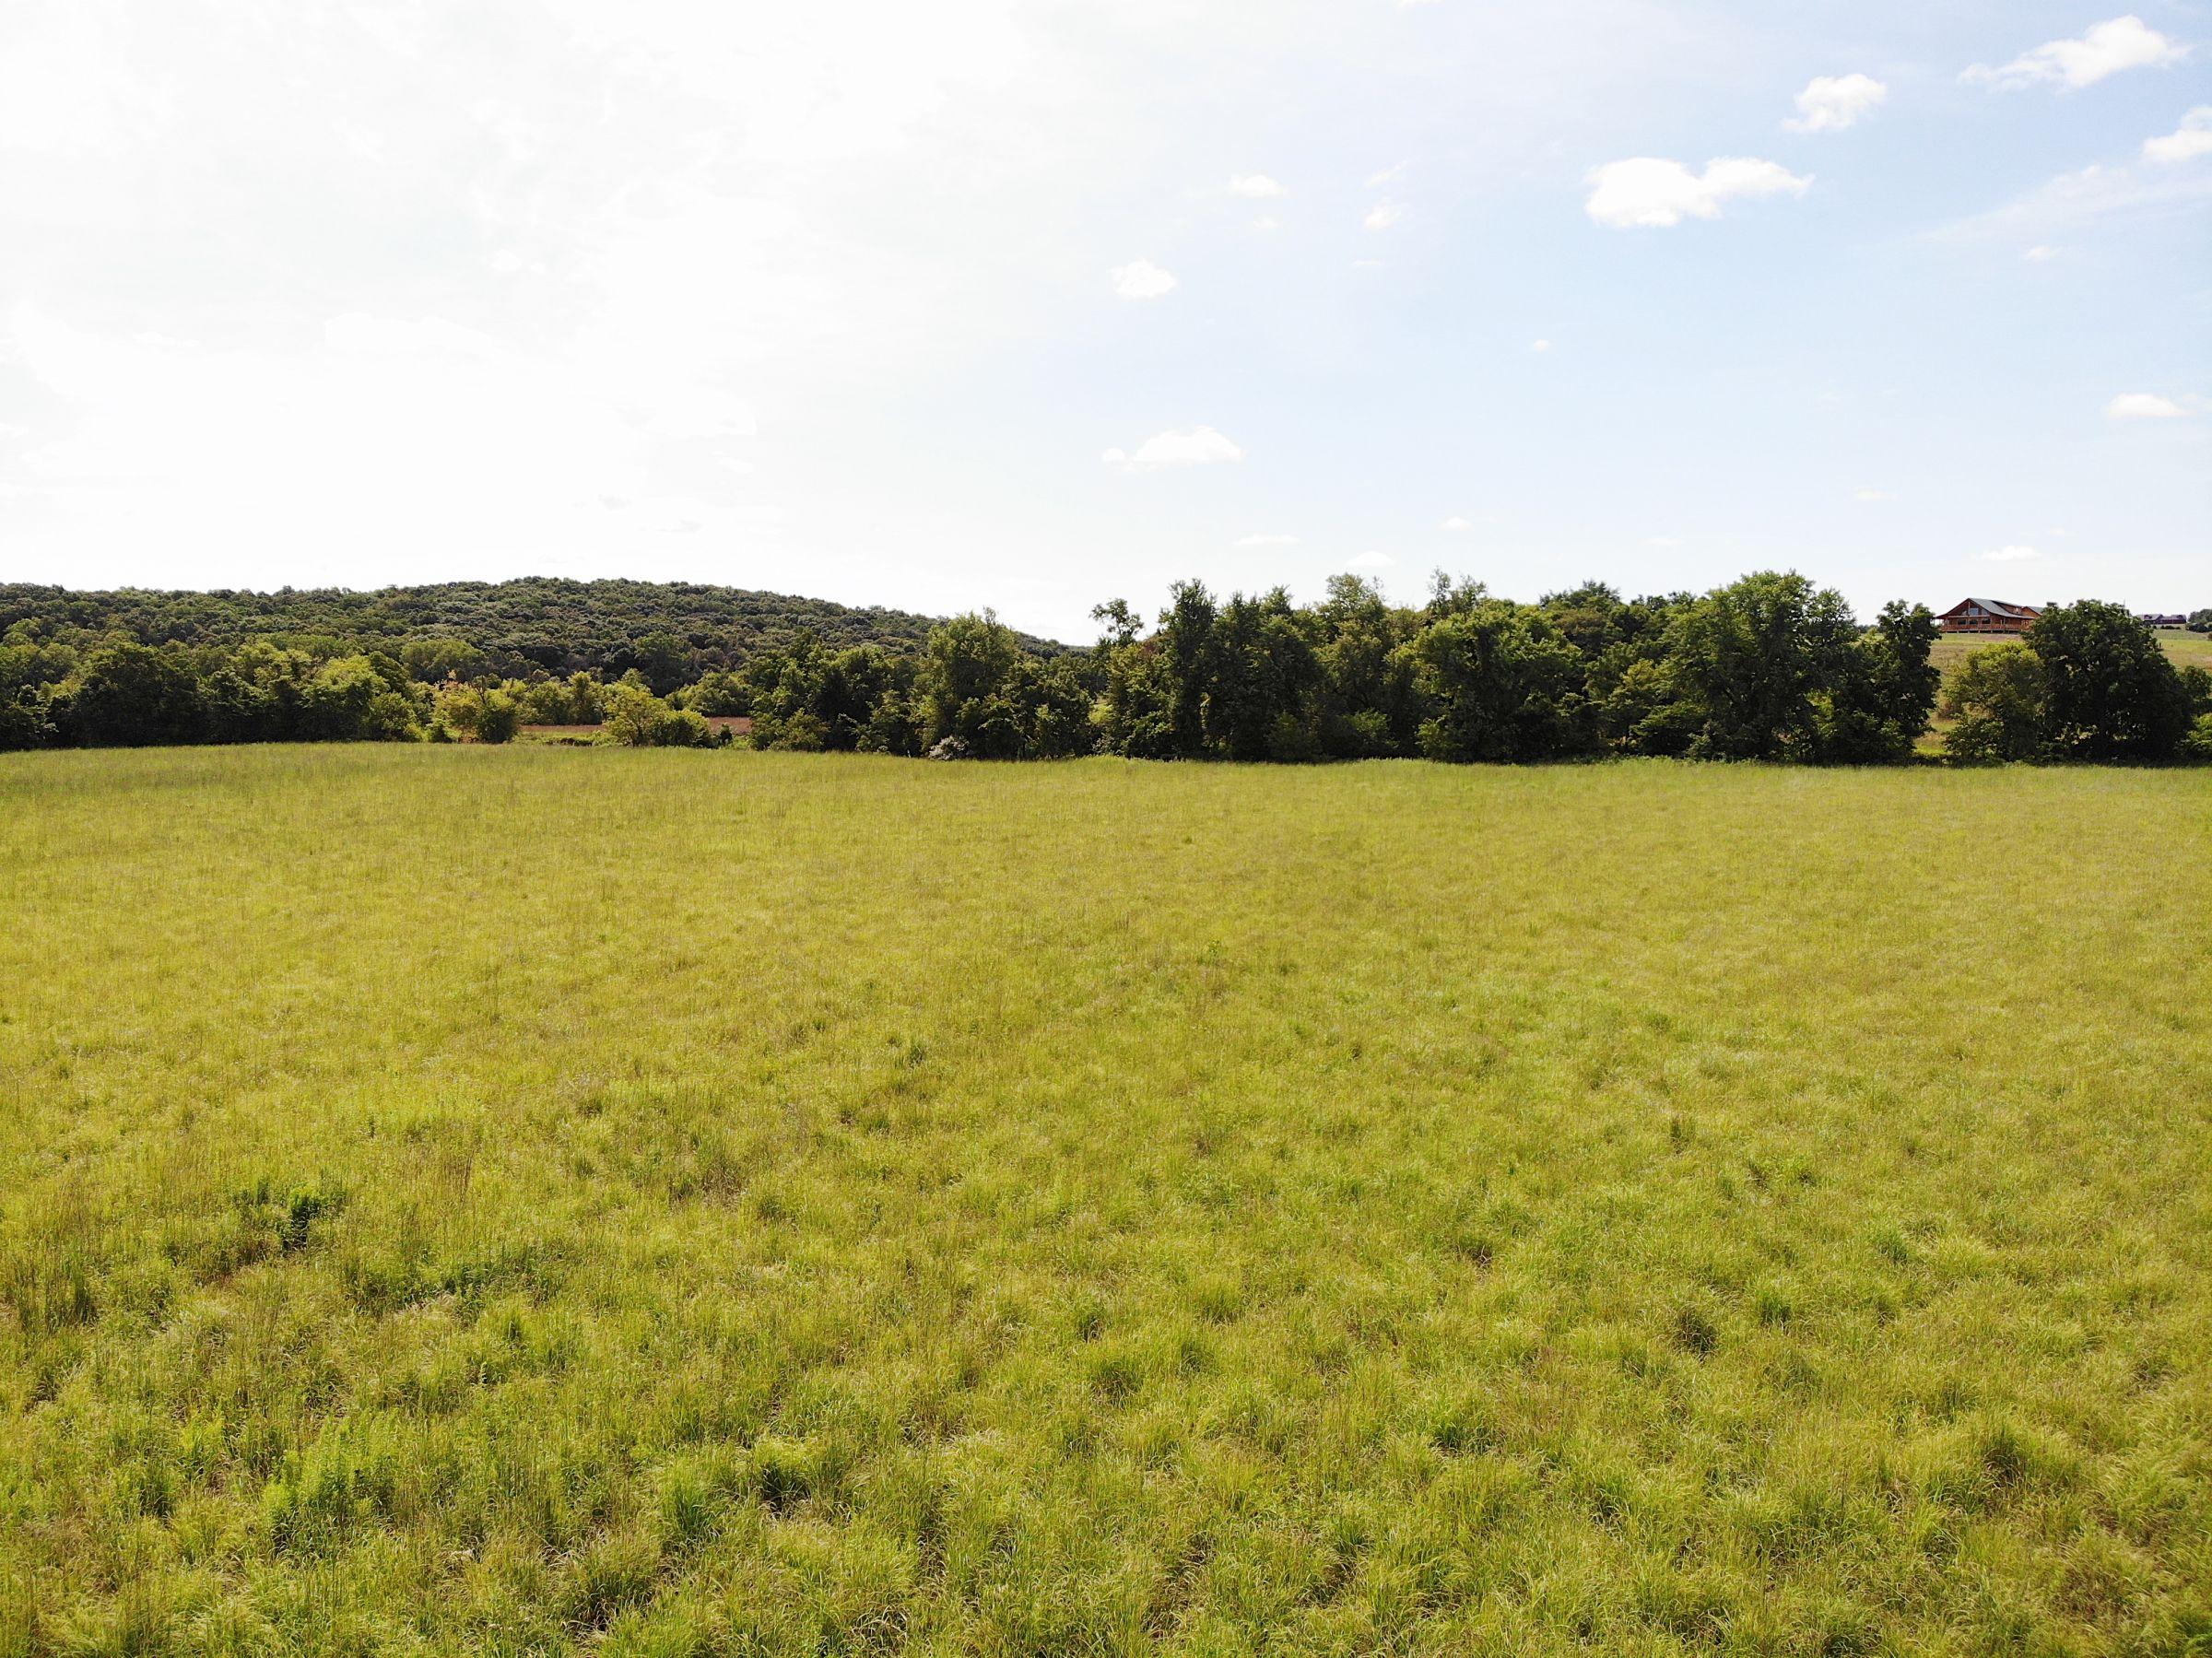 land-warren-county-iowa-84-acres-listing-number-15103-5-2020-08-05-144423.jpg